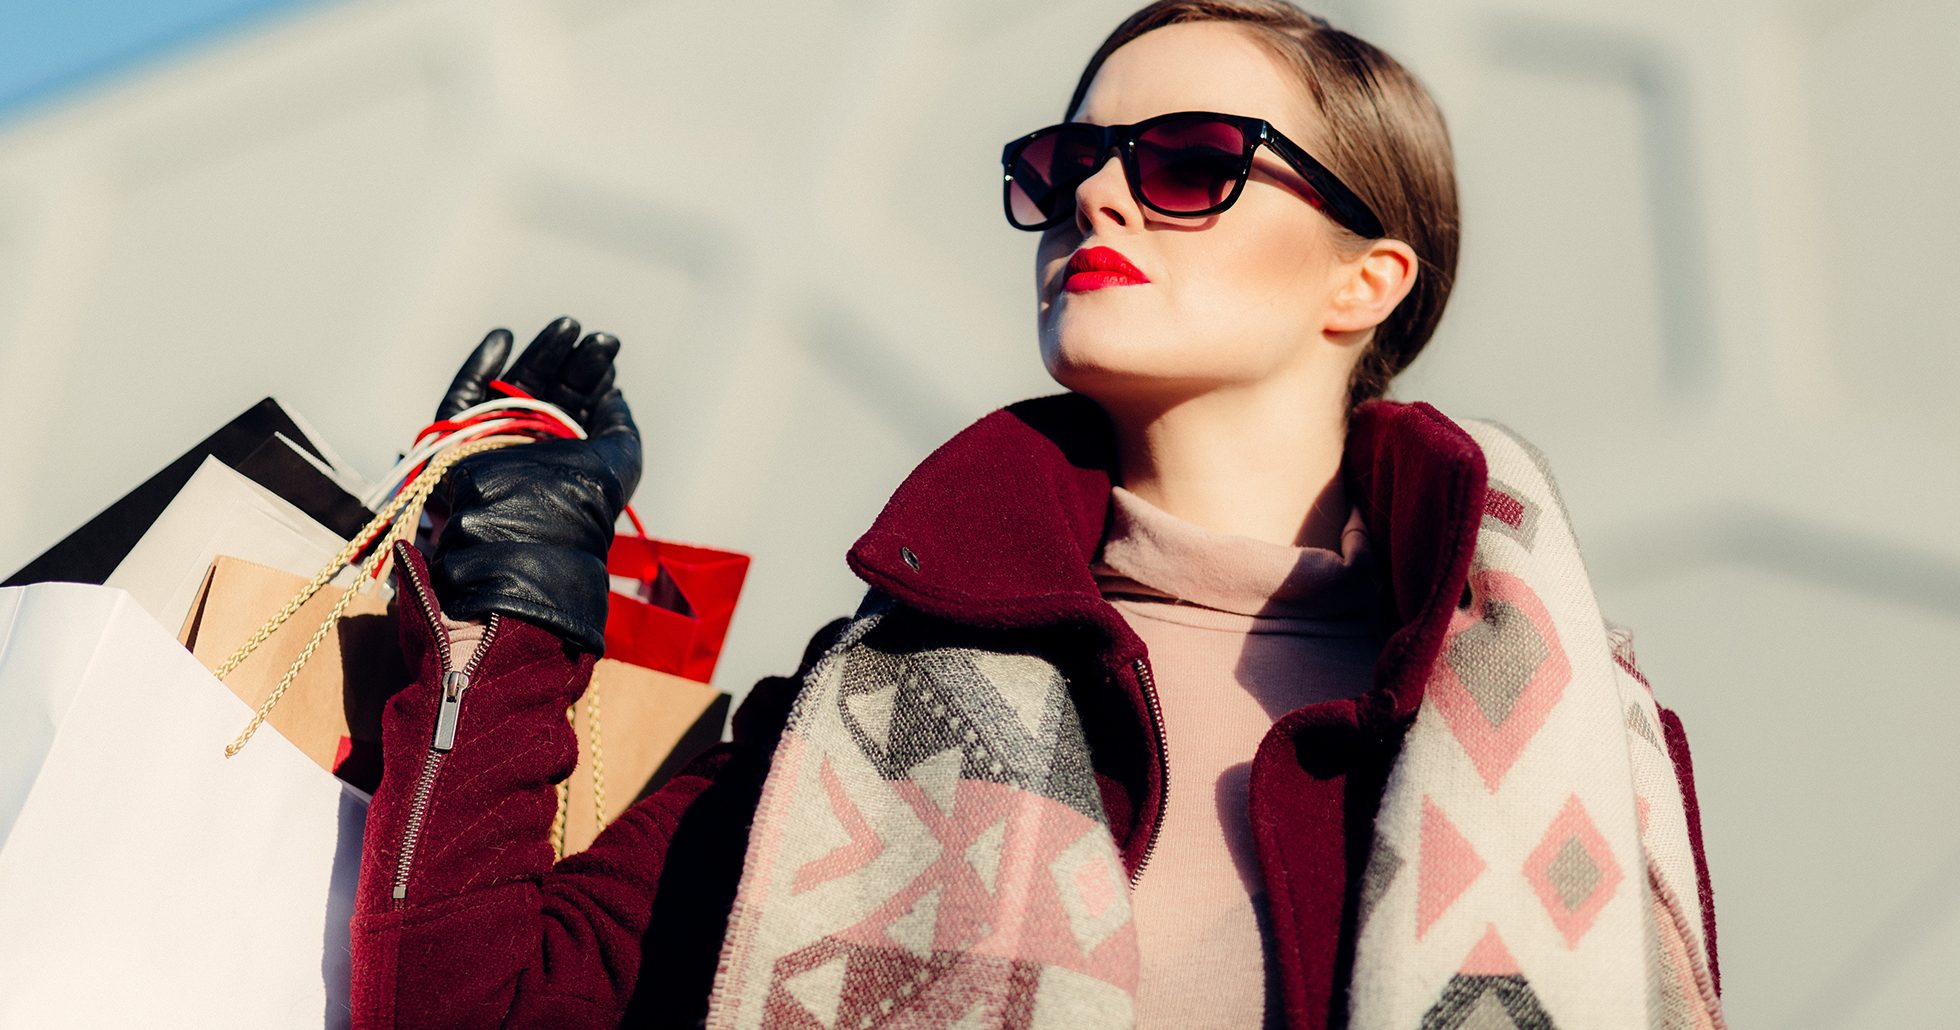 Kvinna med shoppingkassar